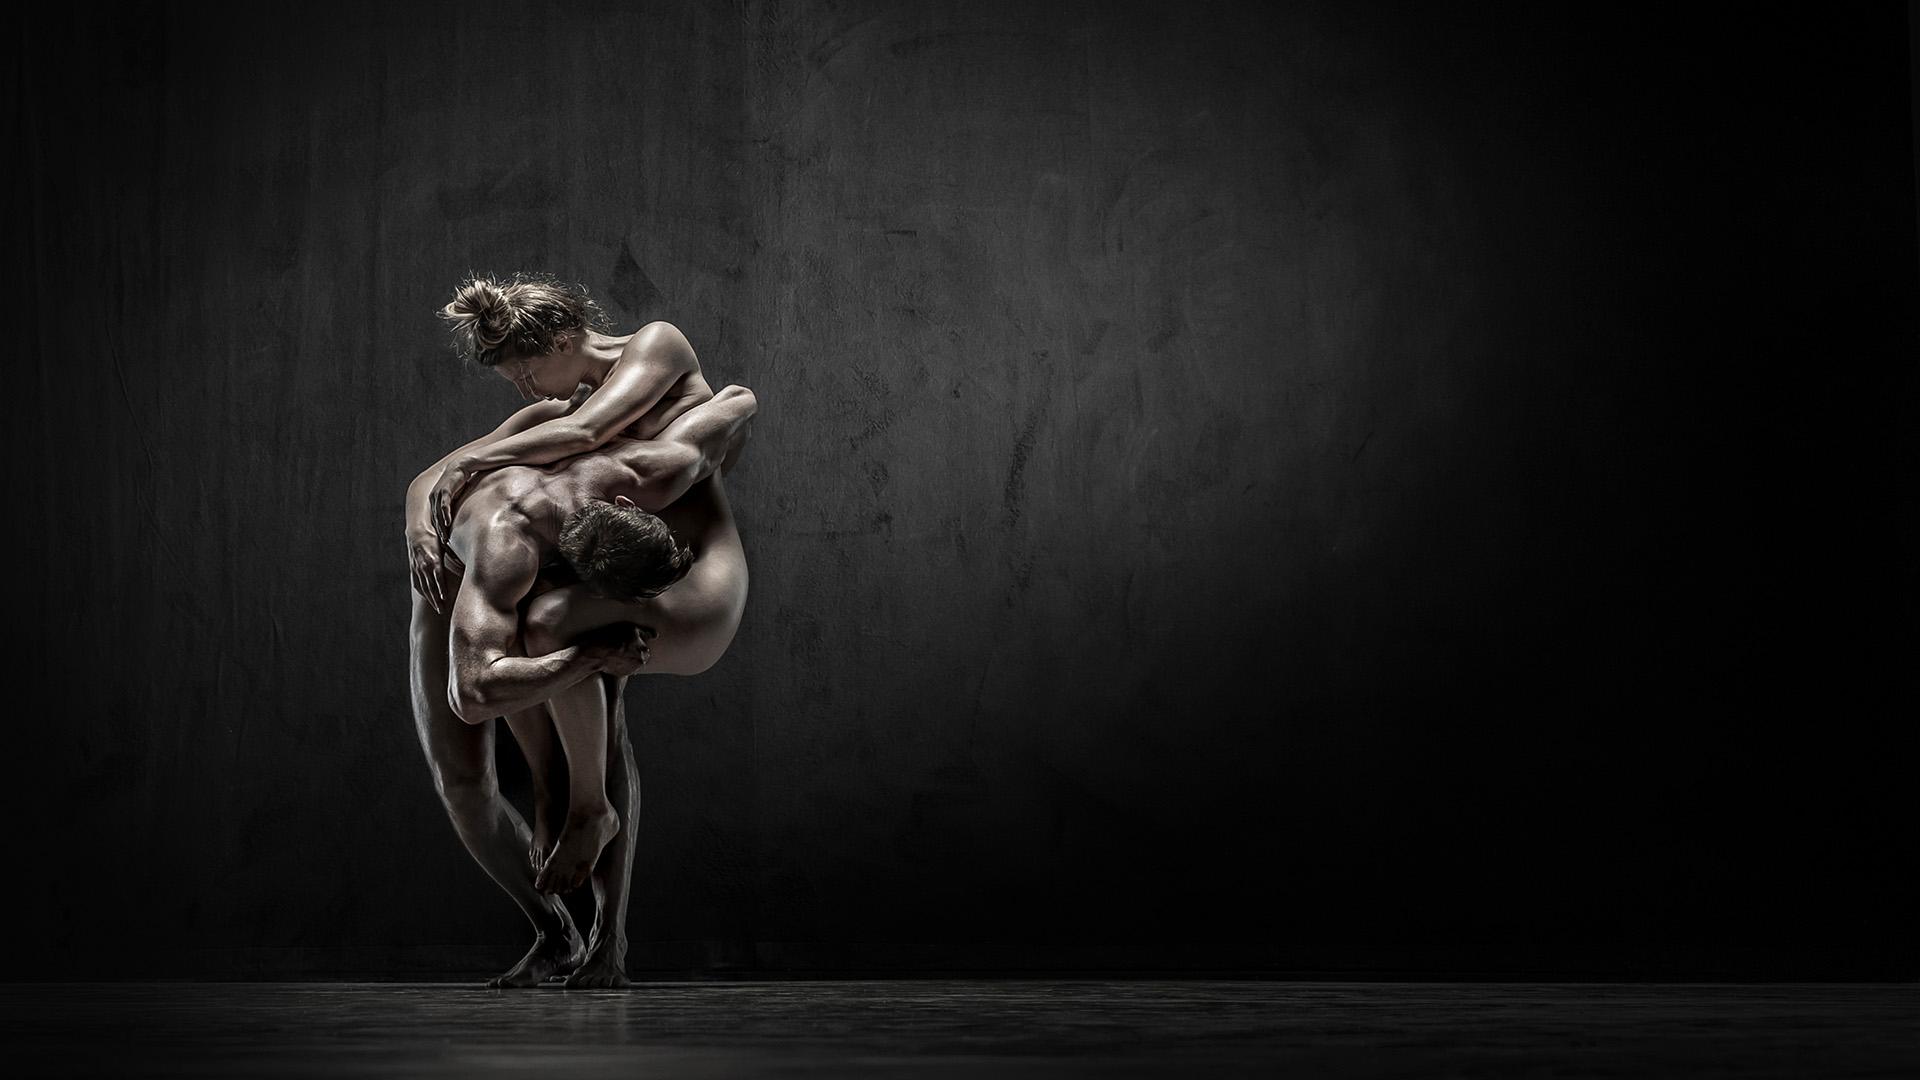 DANIMOVES bei der Akrobatik